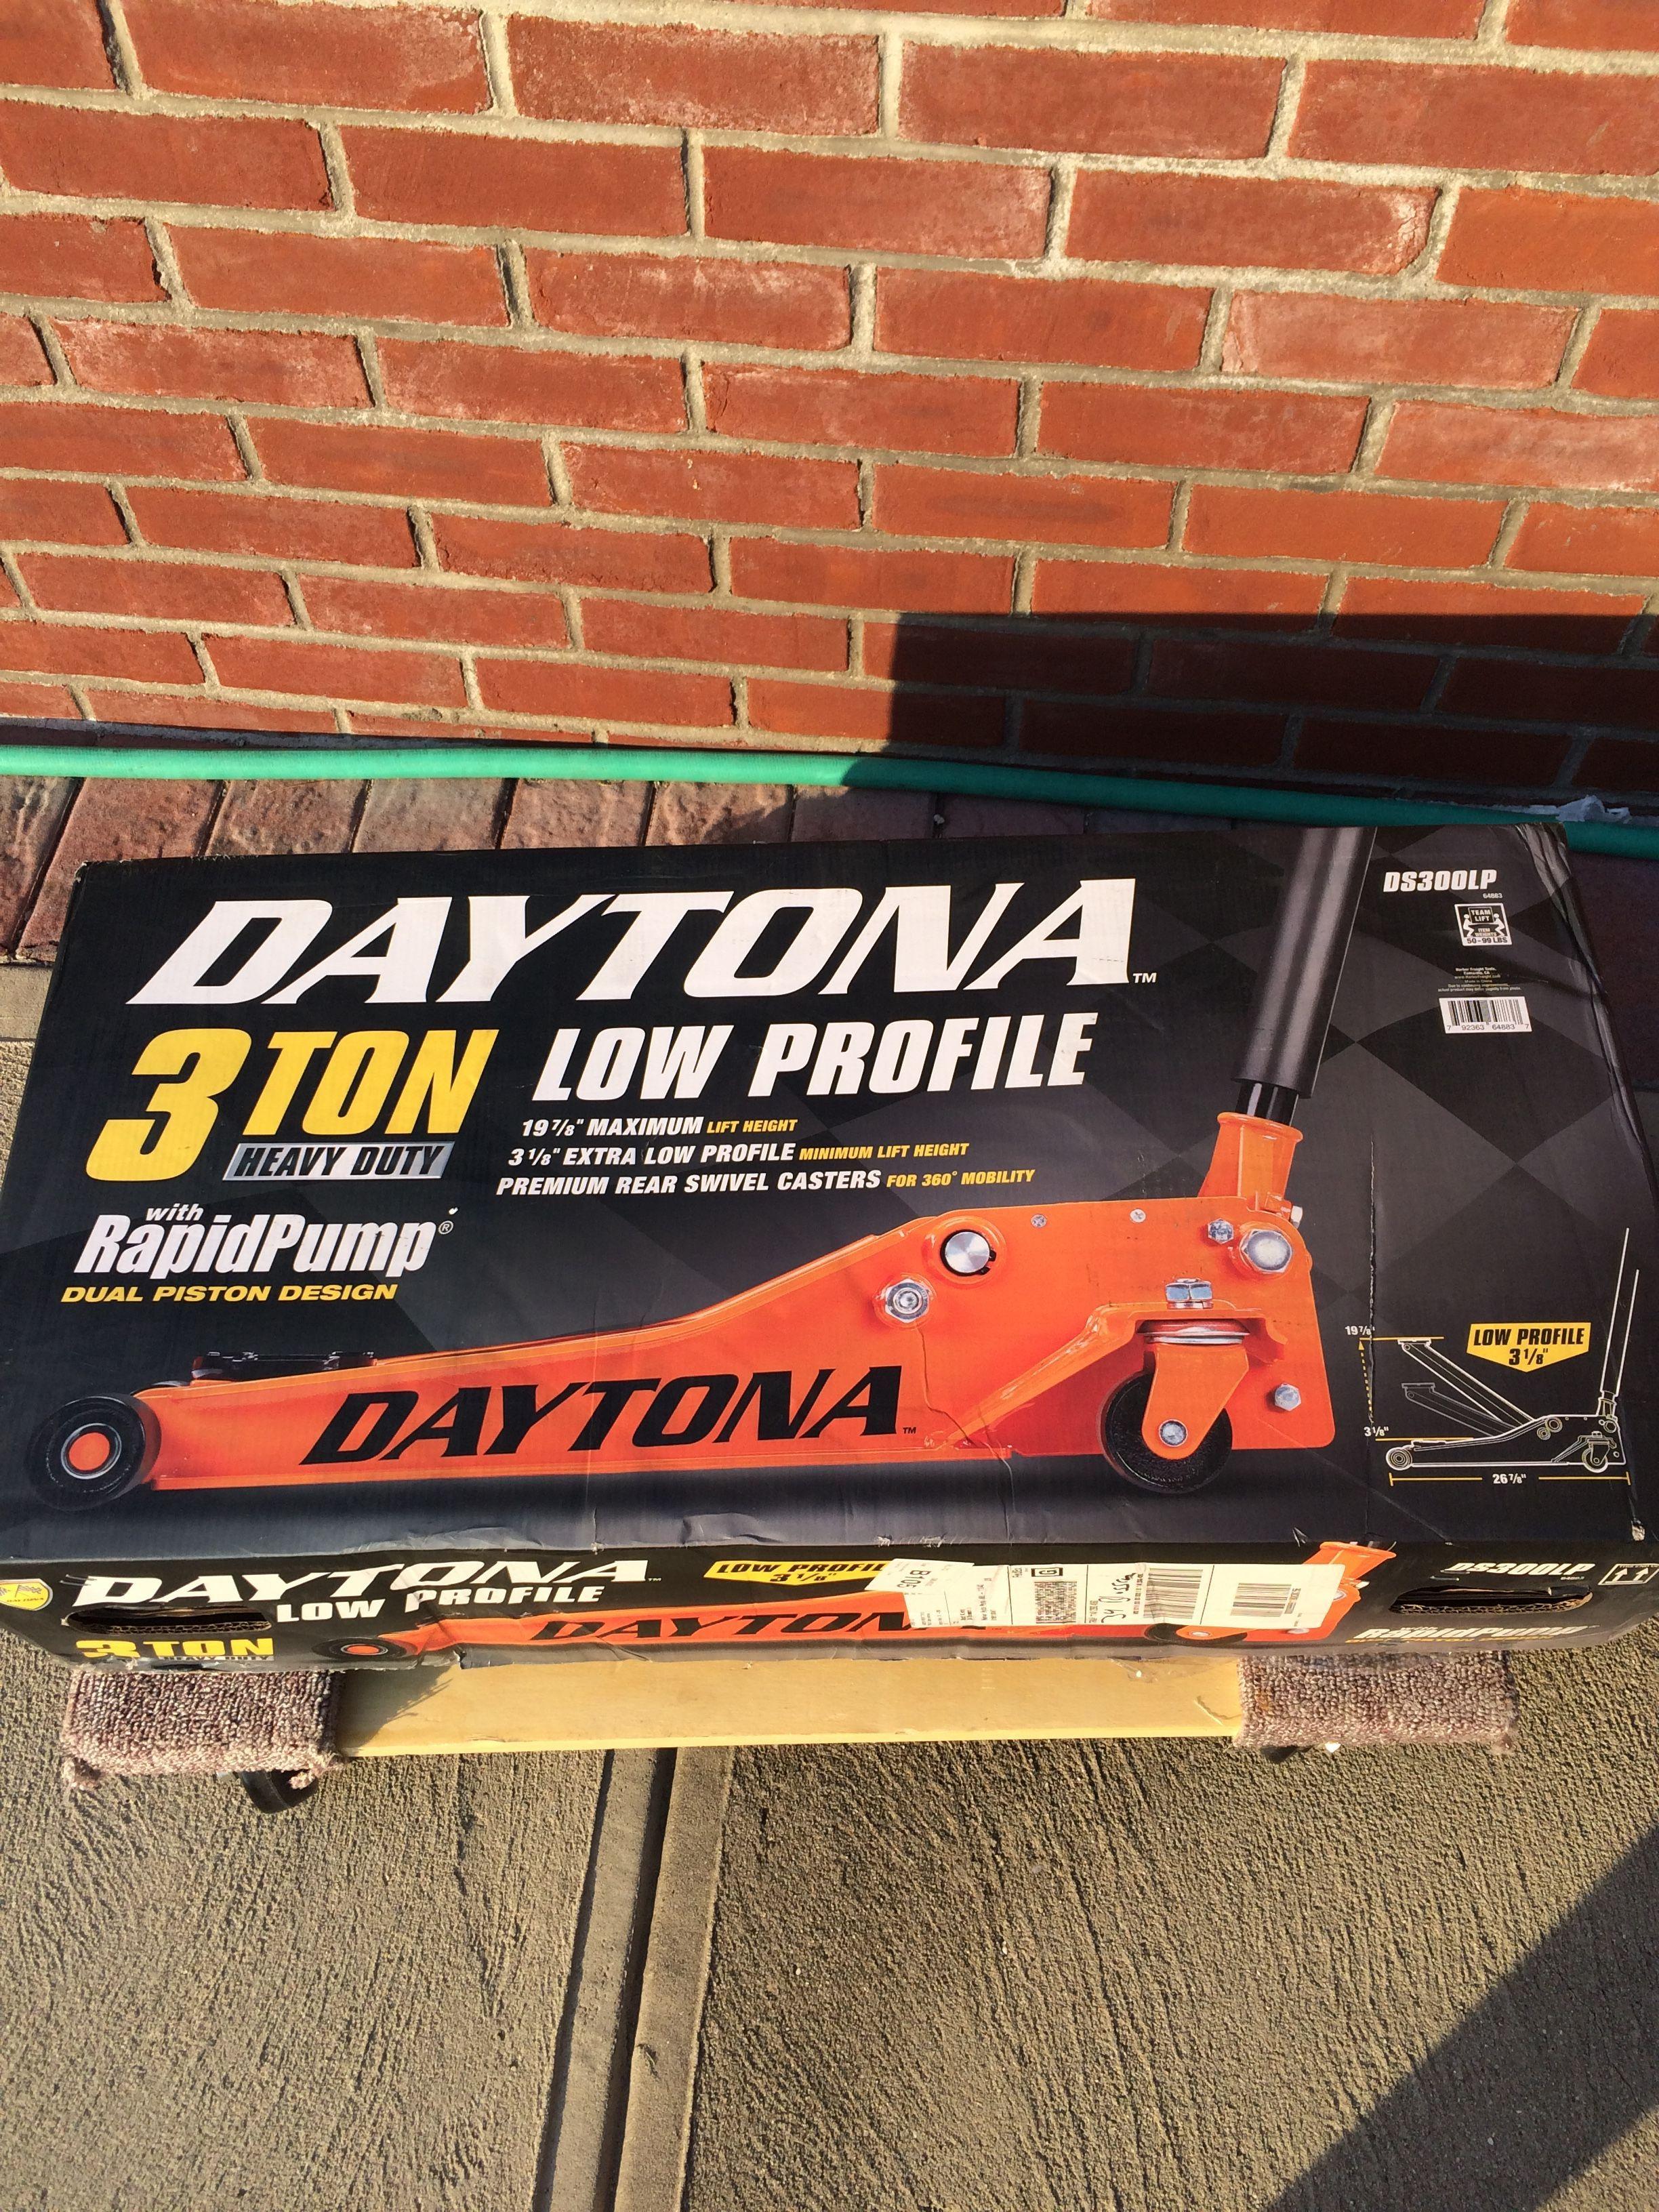 Daytona 3 ton floor jack review Low profile, Floor